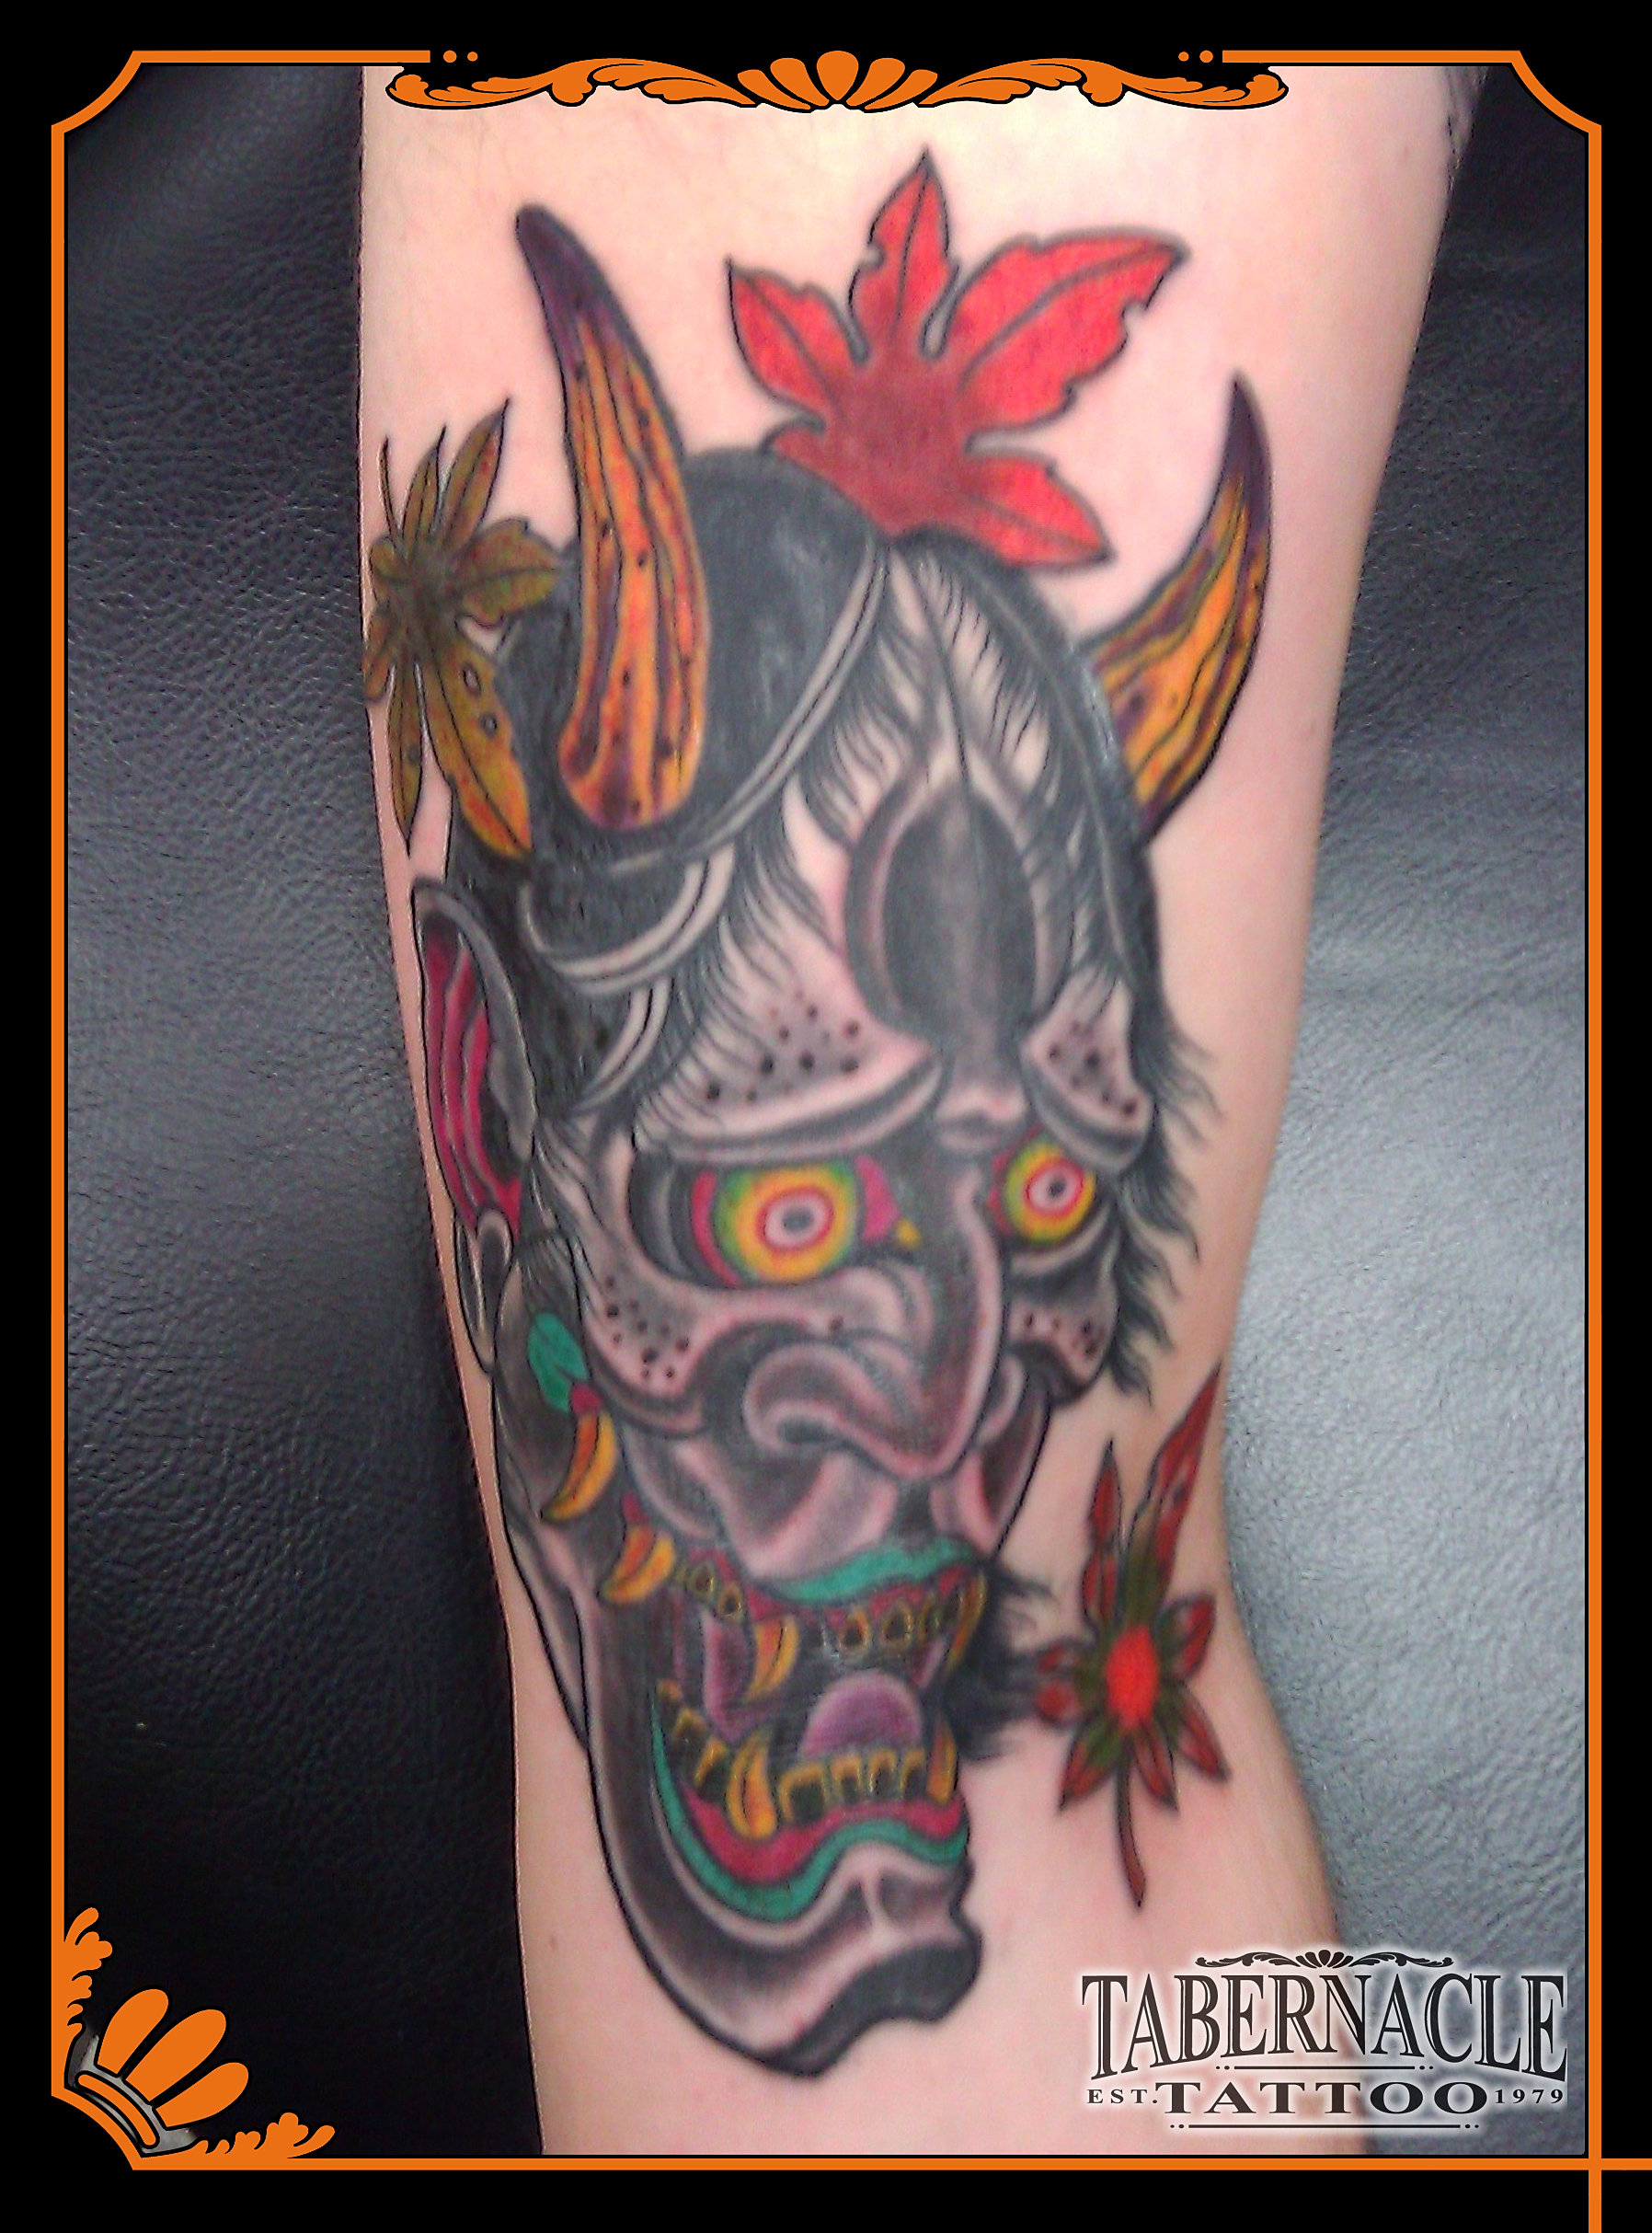 Tabernacle tattoo tampa for Tattoo shops in ybor